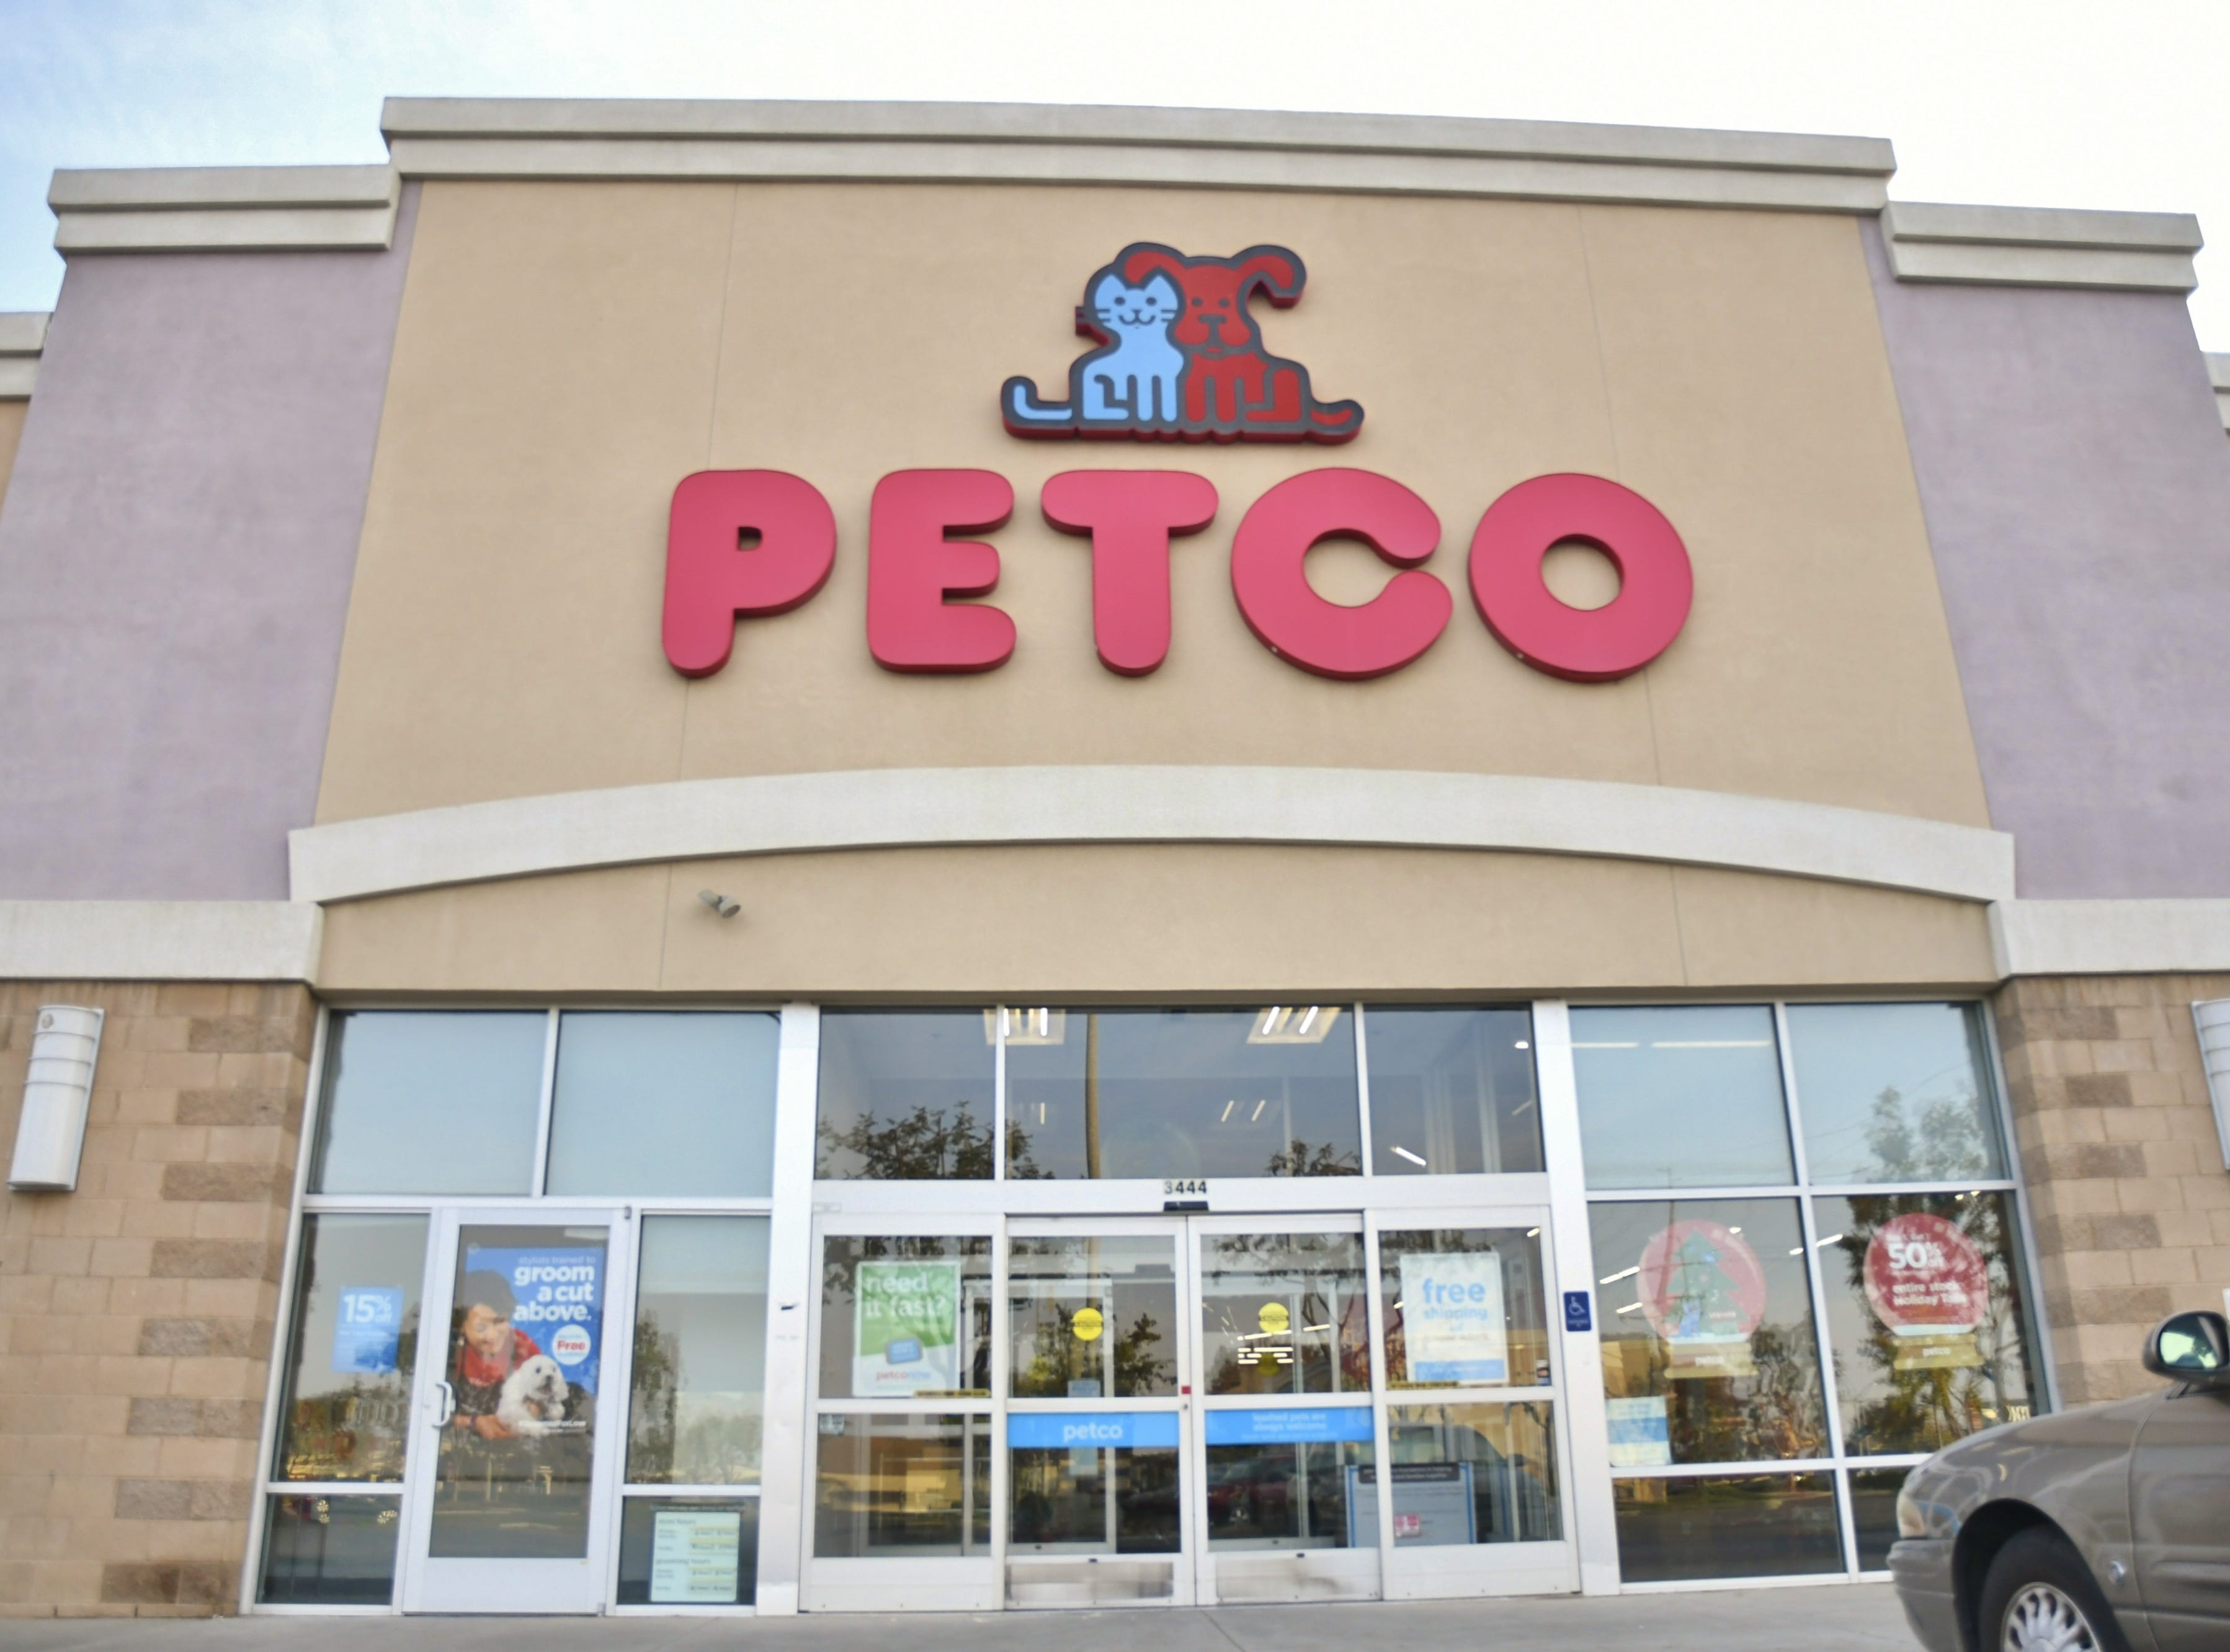 PetCo on Tuesday, November 13.